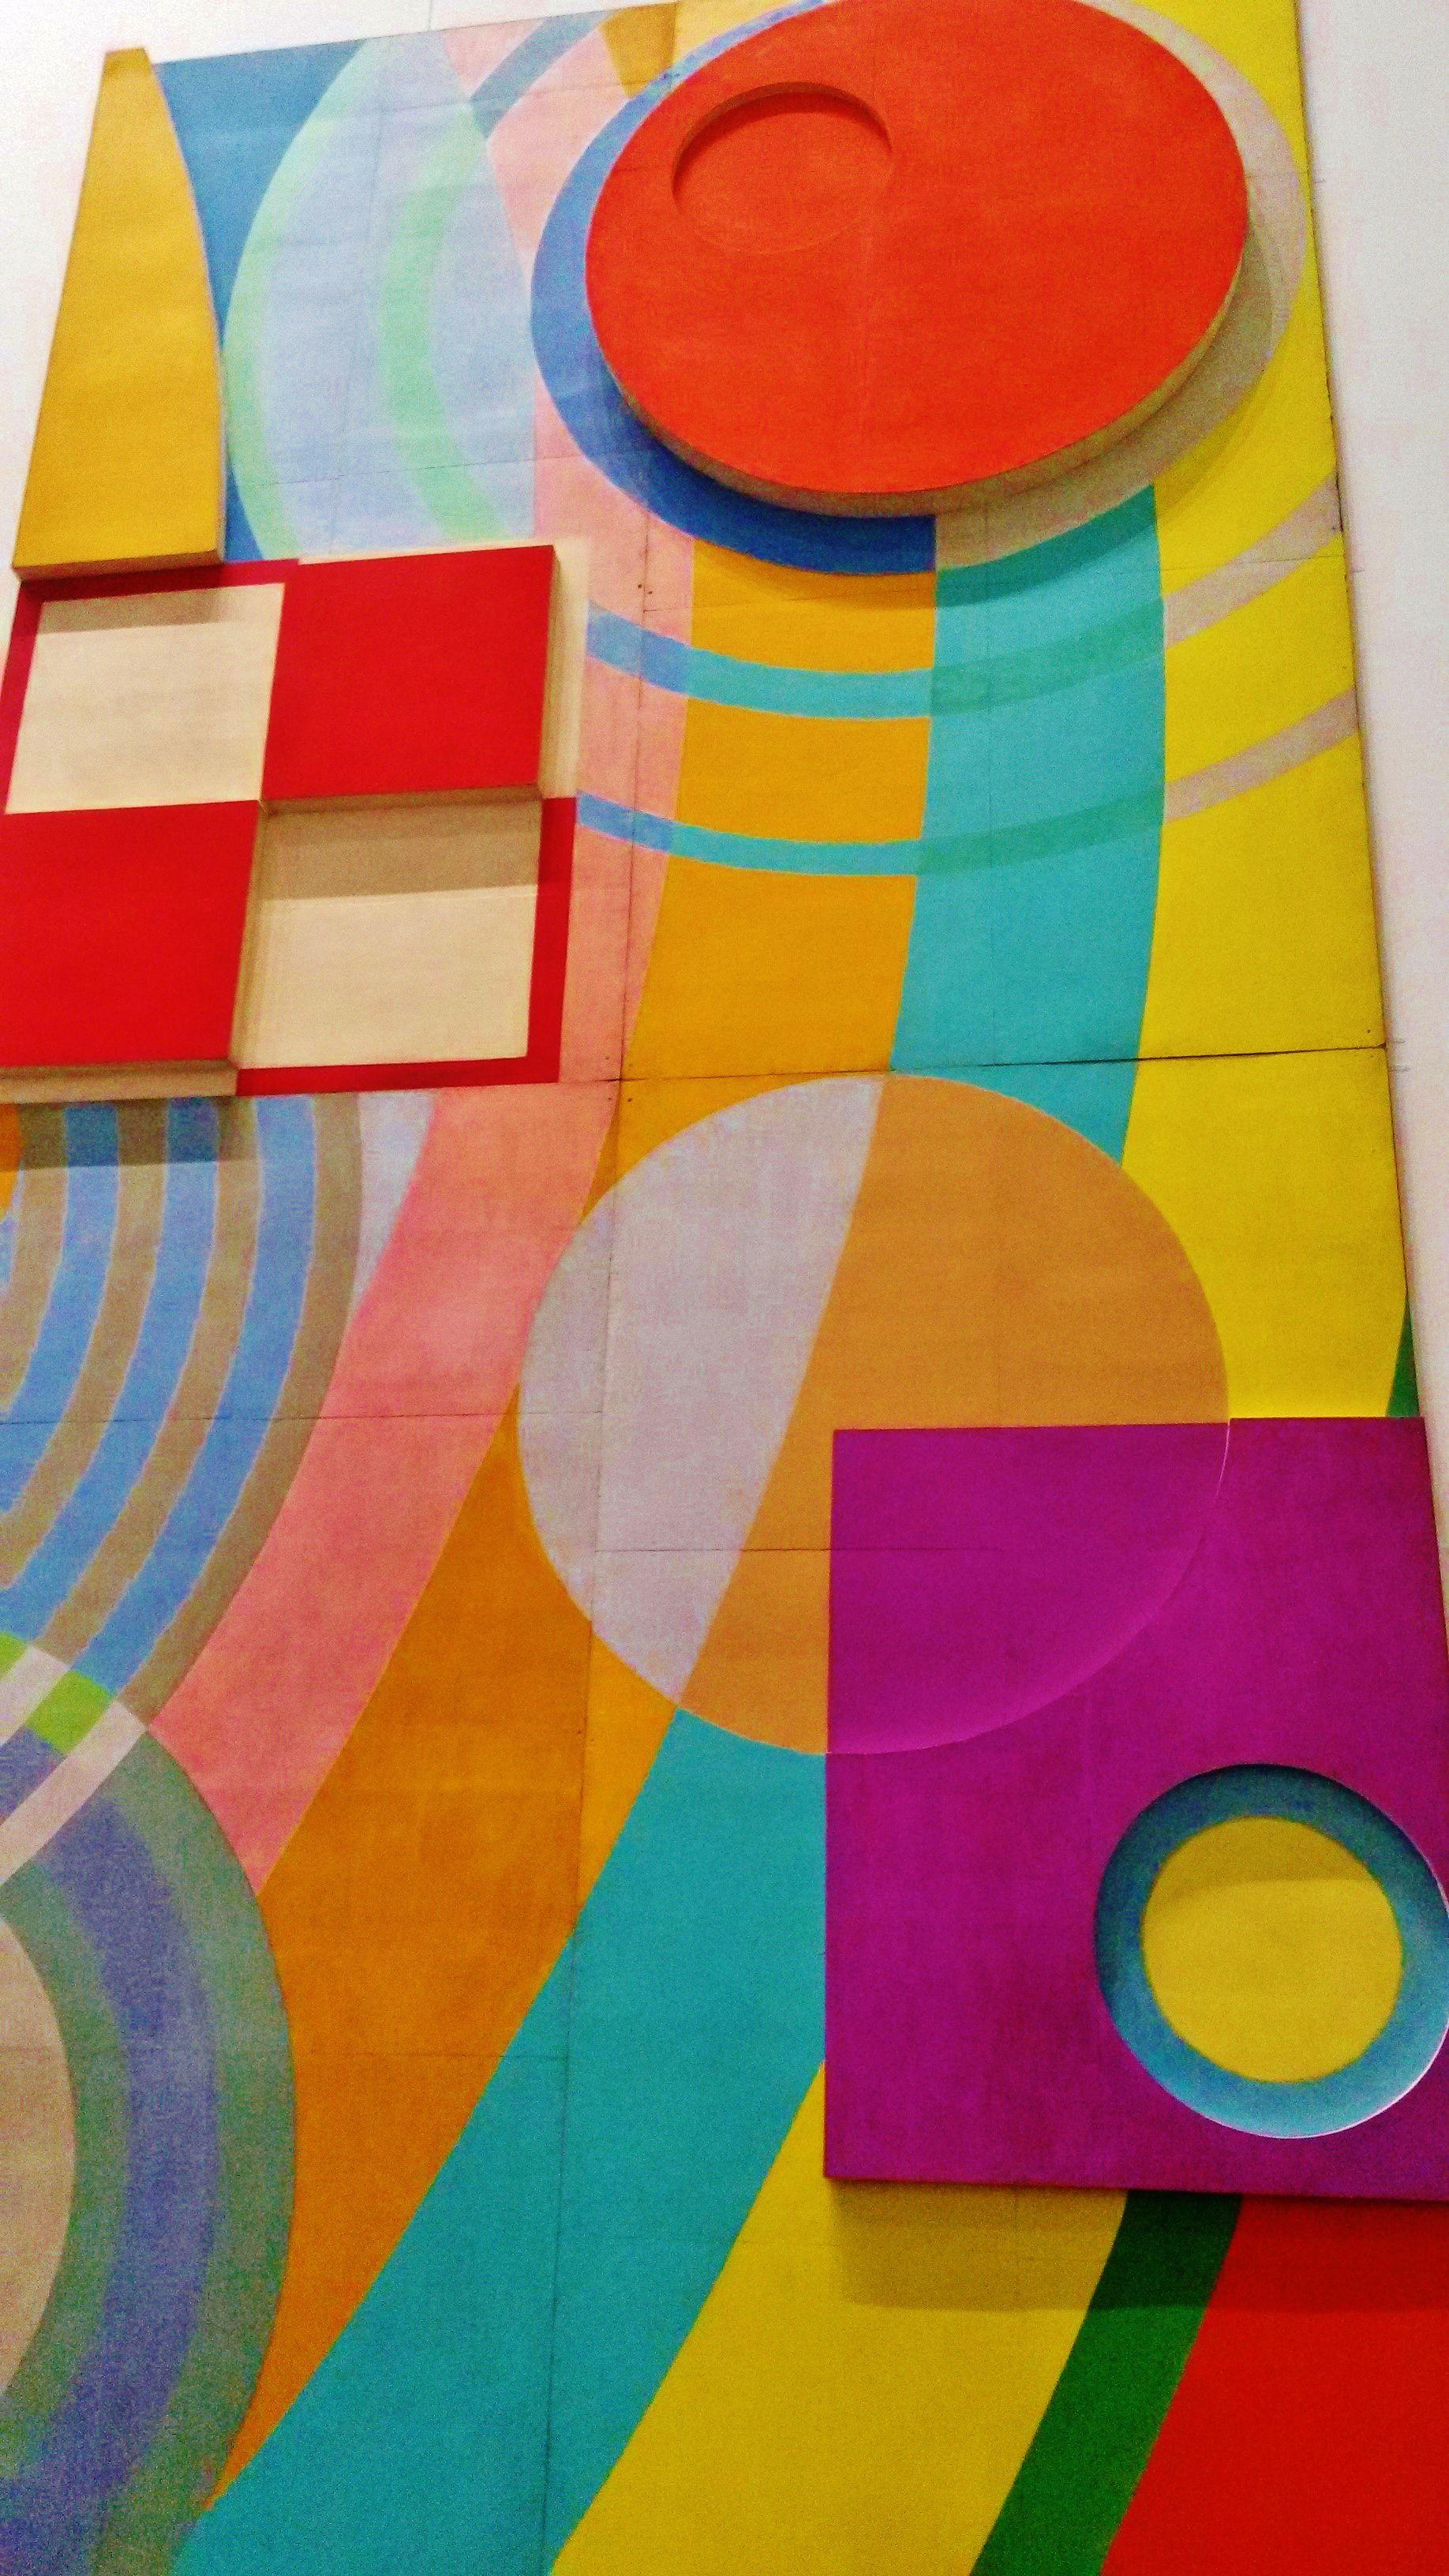 Robert Delaunay - Centre Pompidou Metz | Artists: Sonia & R.Delaunay ...